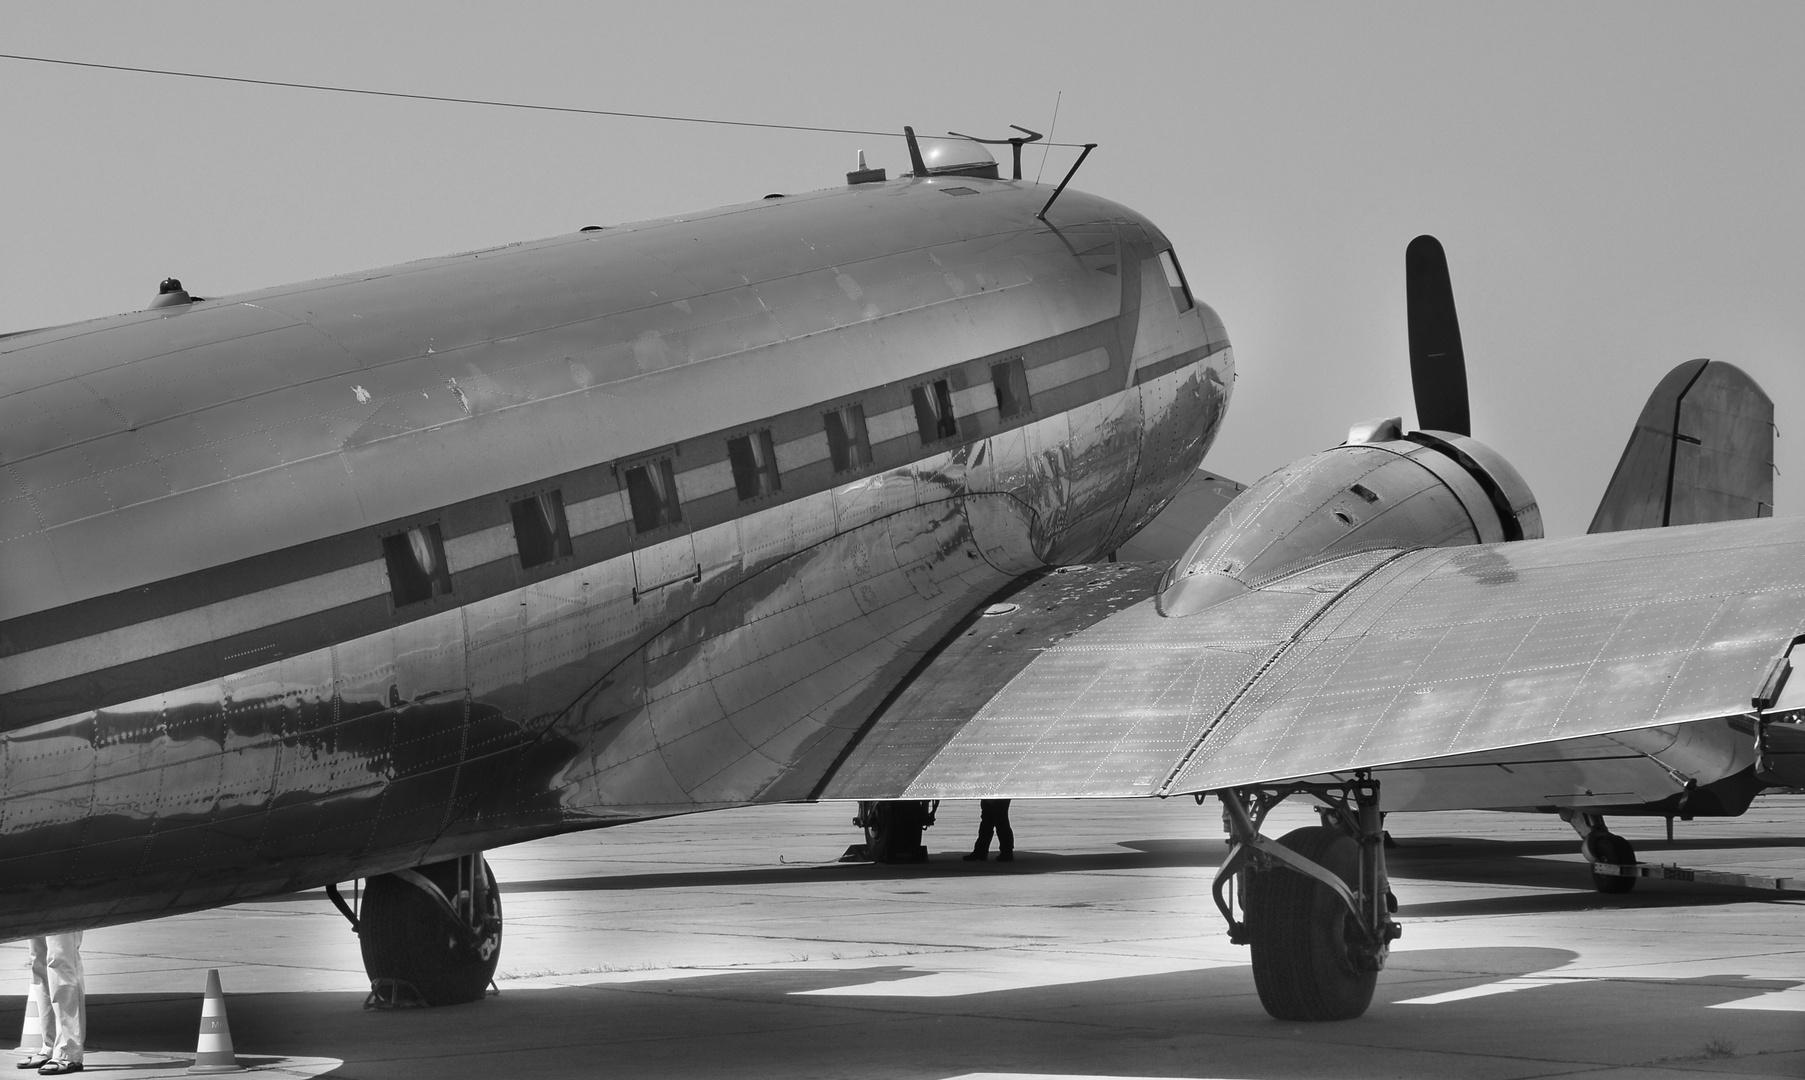 Flight History - BW 1st try